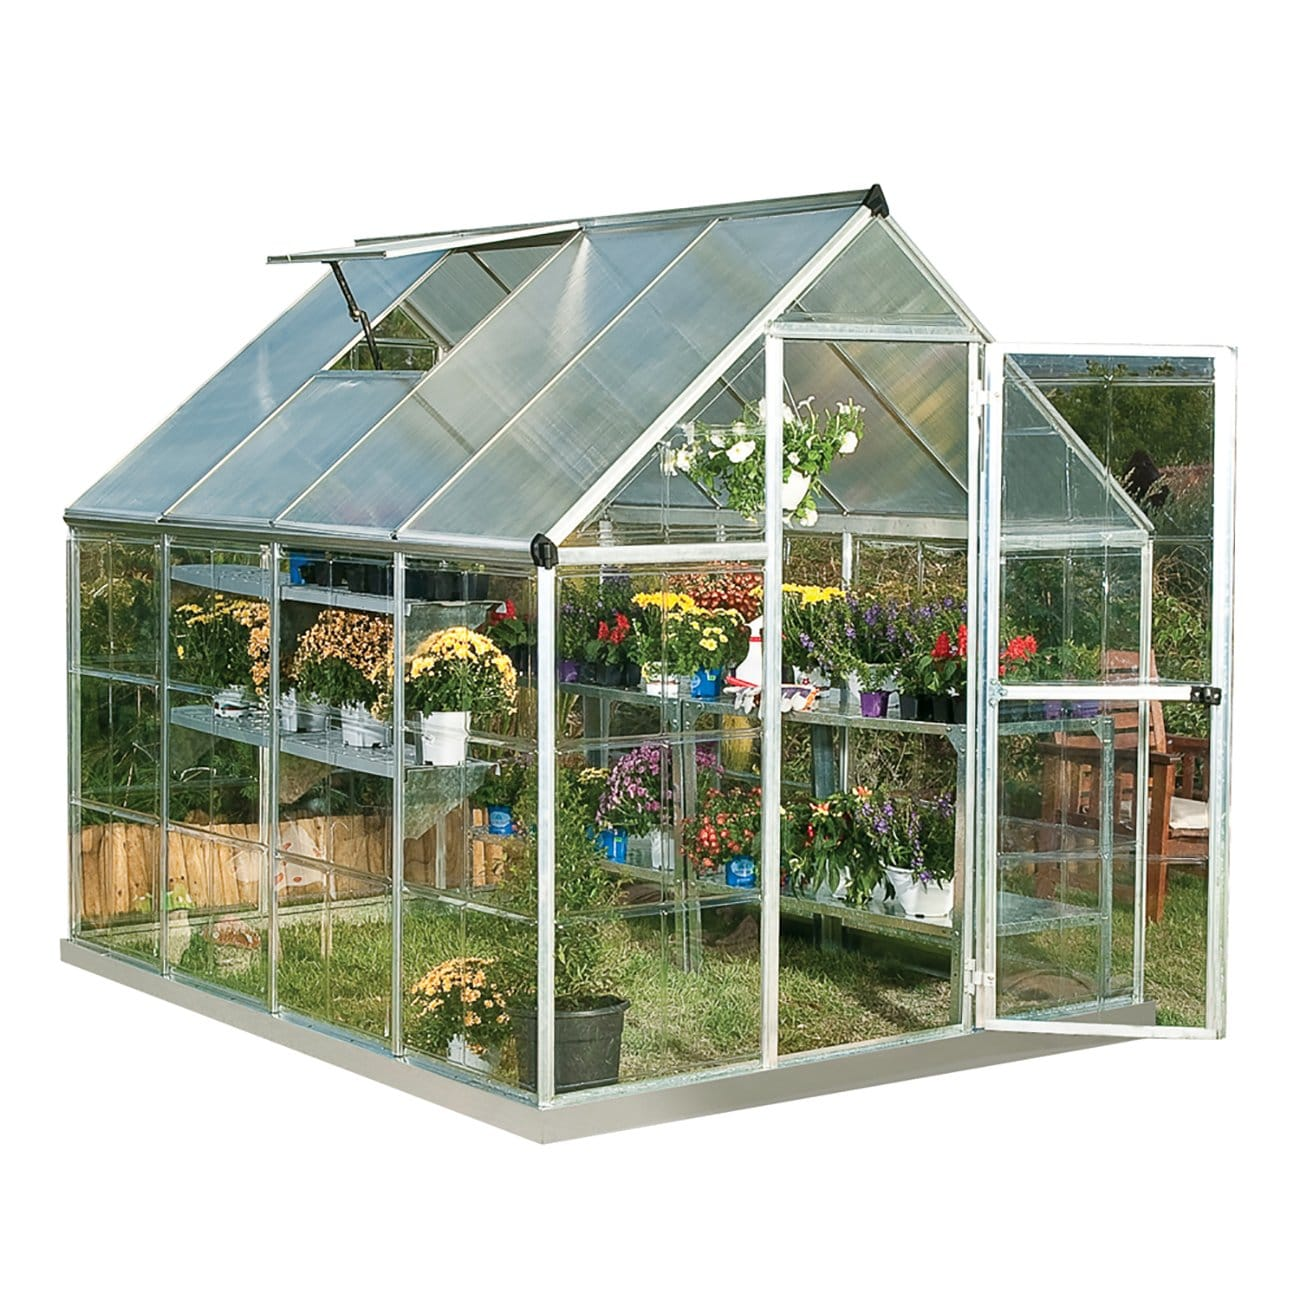 palram hg5508 hybrid greenhouse 6 x 8 x 7 silver